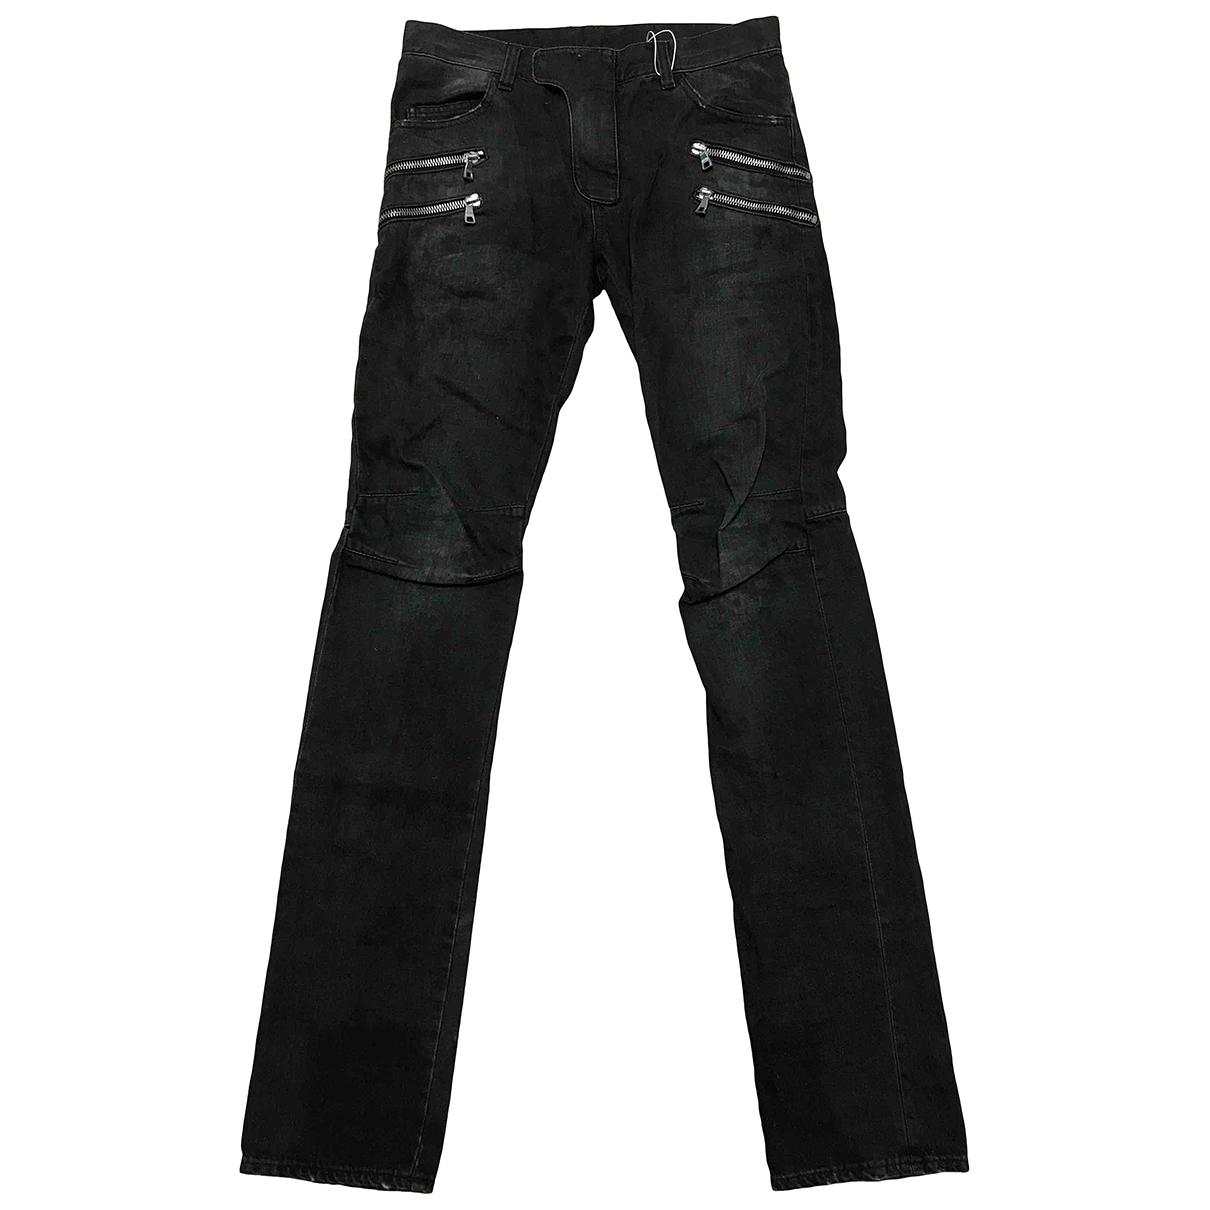 Balmain \N Jeans in  Anthrazit Baumwolle